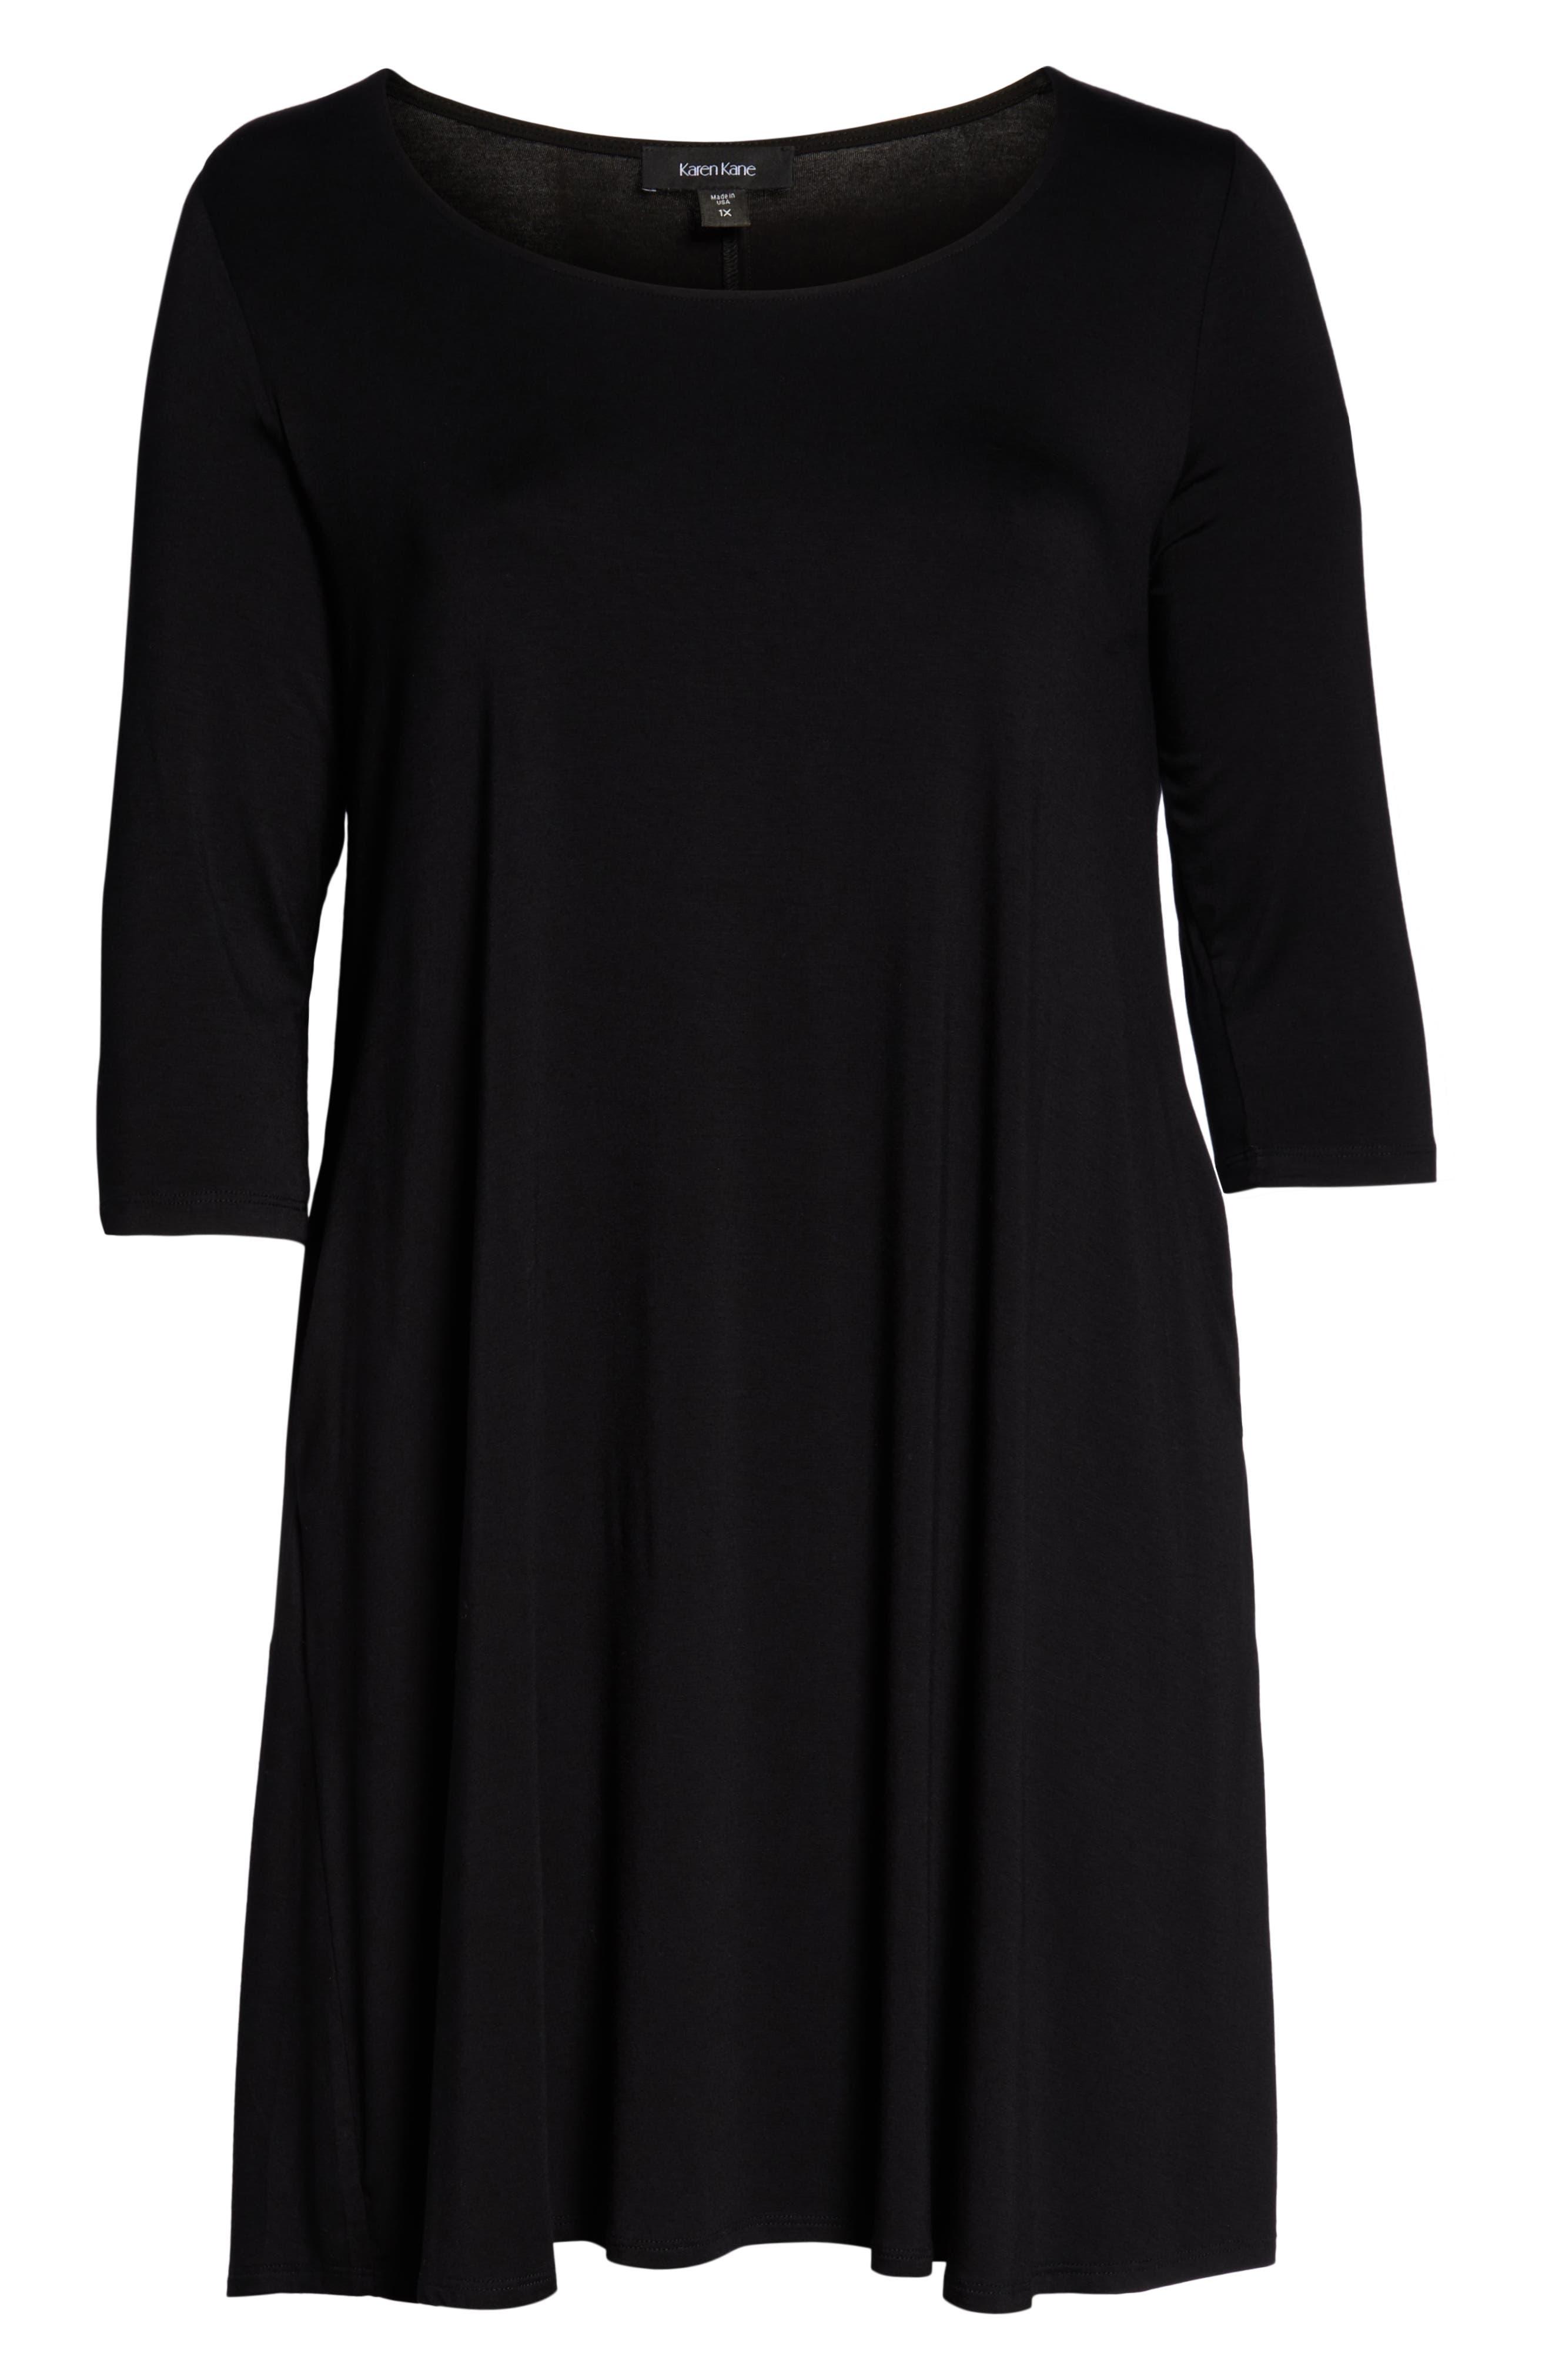 Chloe A-Line Dress,                             Alternate thumbnail 3, color,                             BLACK